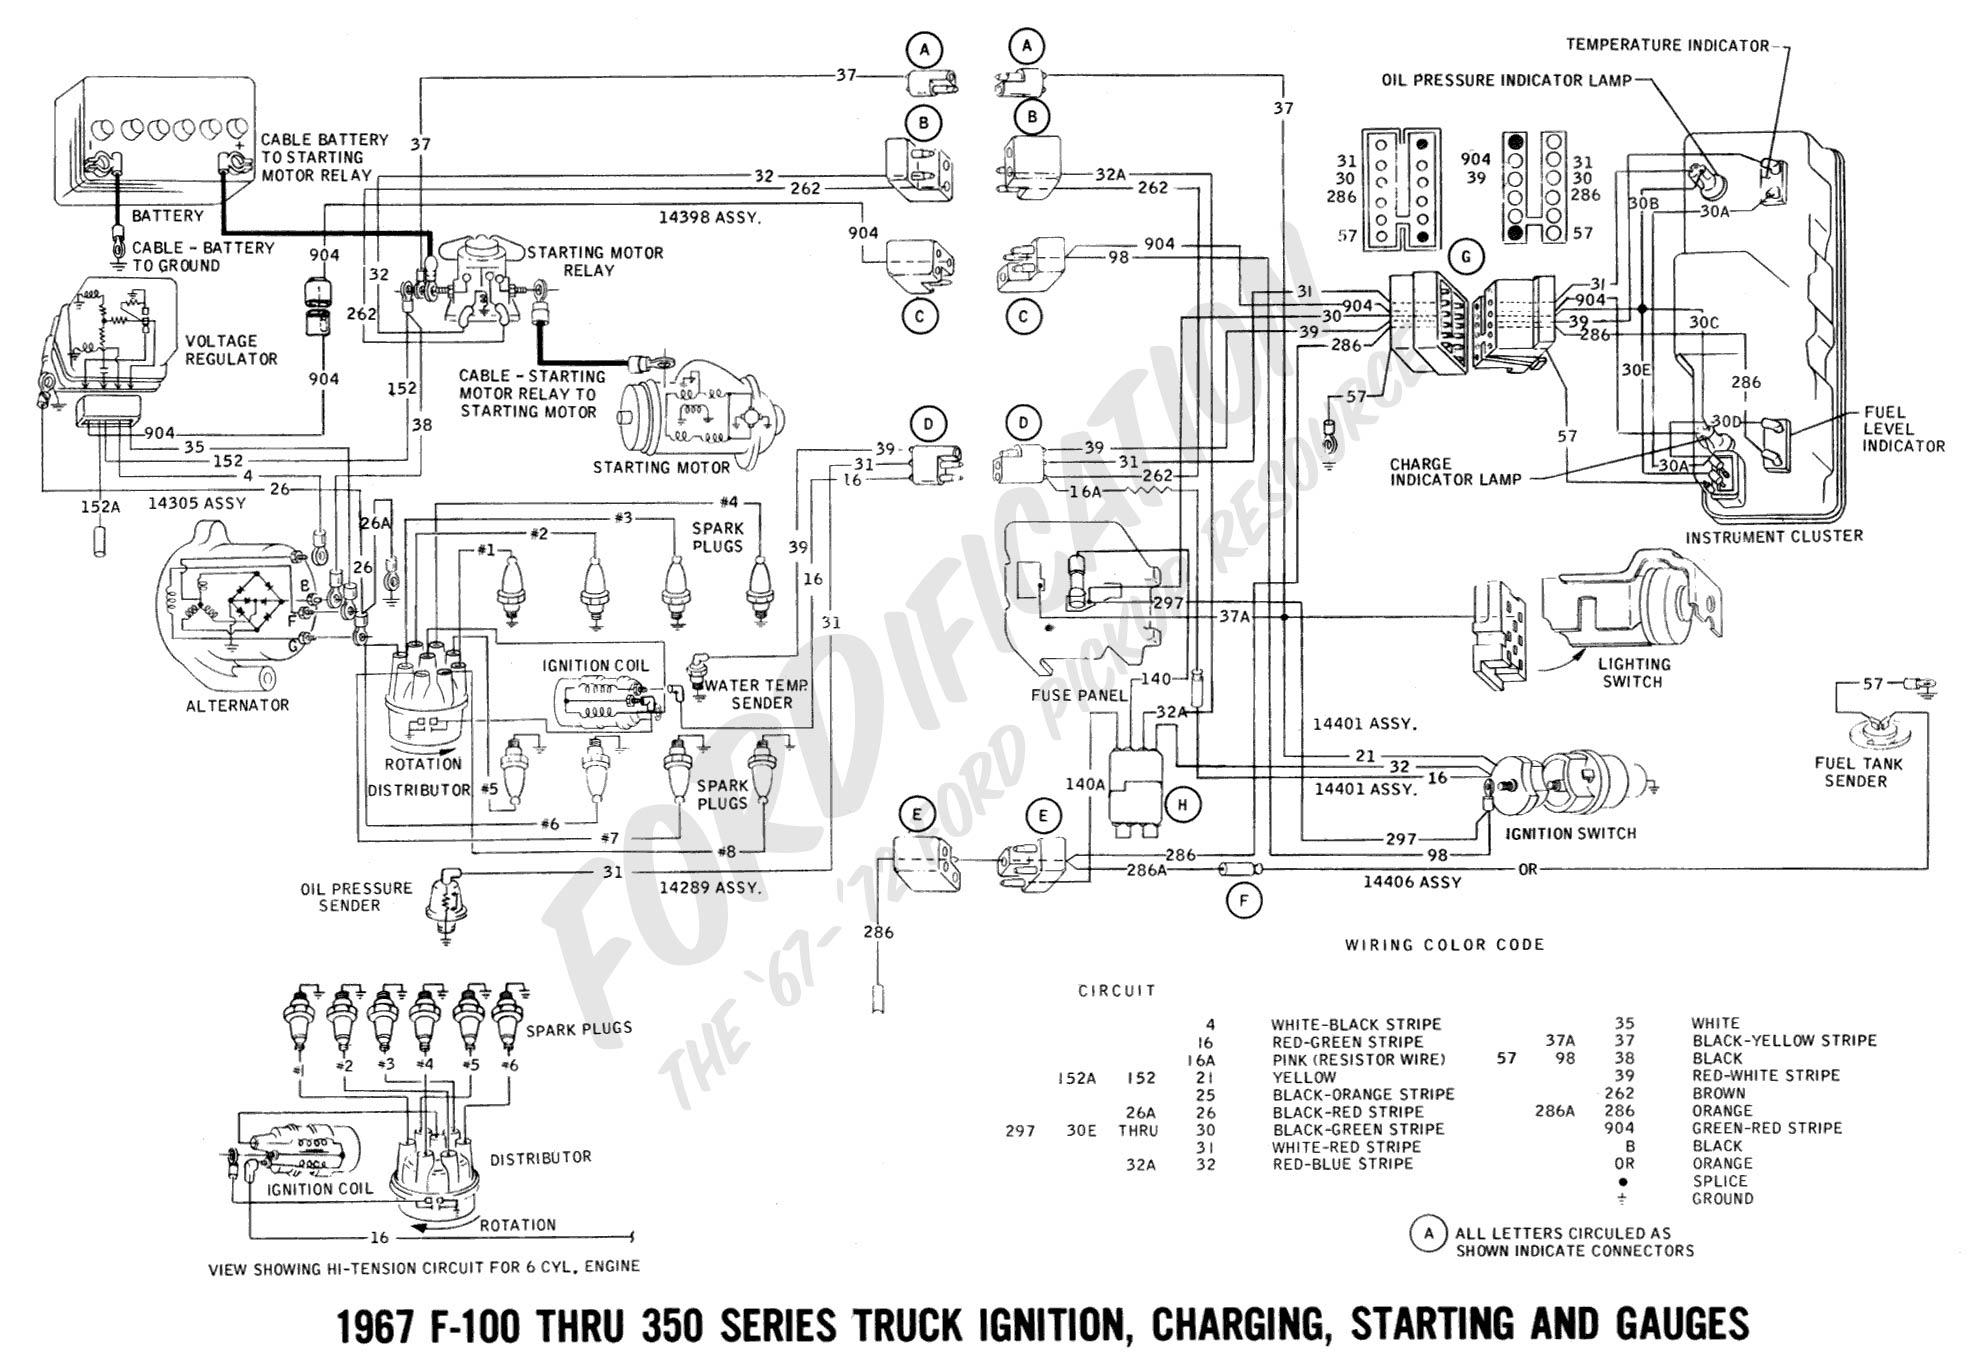 99 f250 headlight wiring diagram dodge ram oem parts 1999 18 6 stromoeko de 1968 blog rh 19 14 german military photos ford